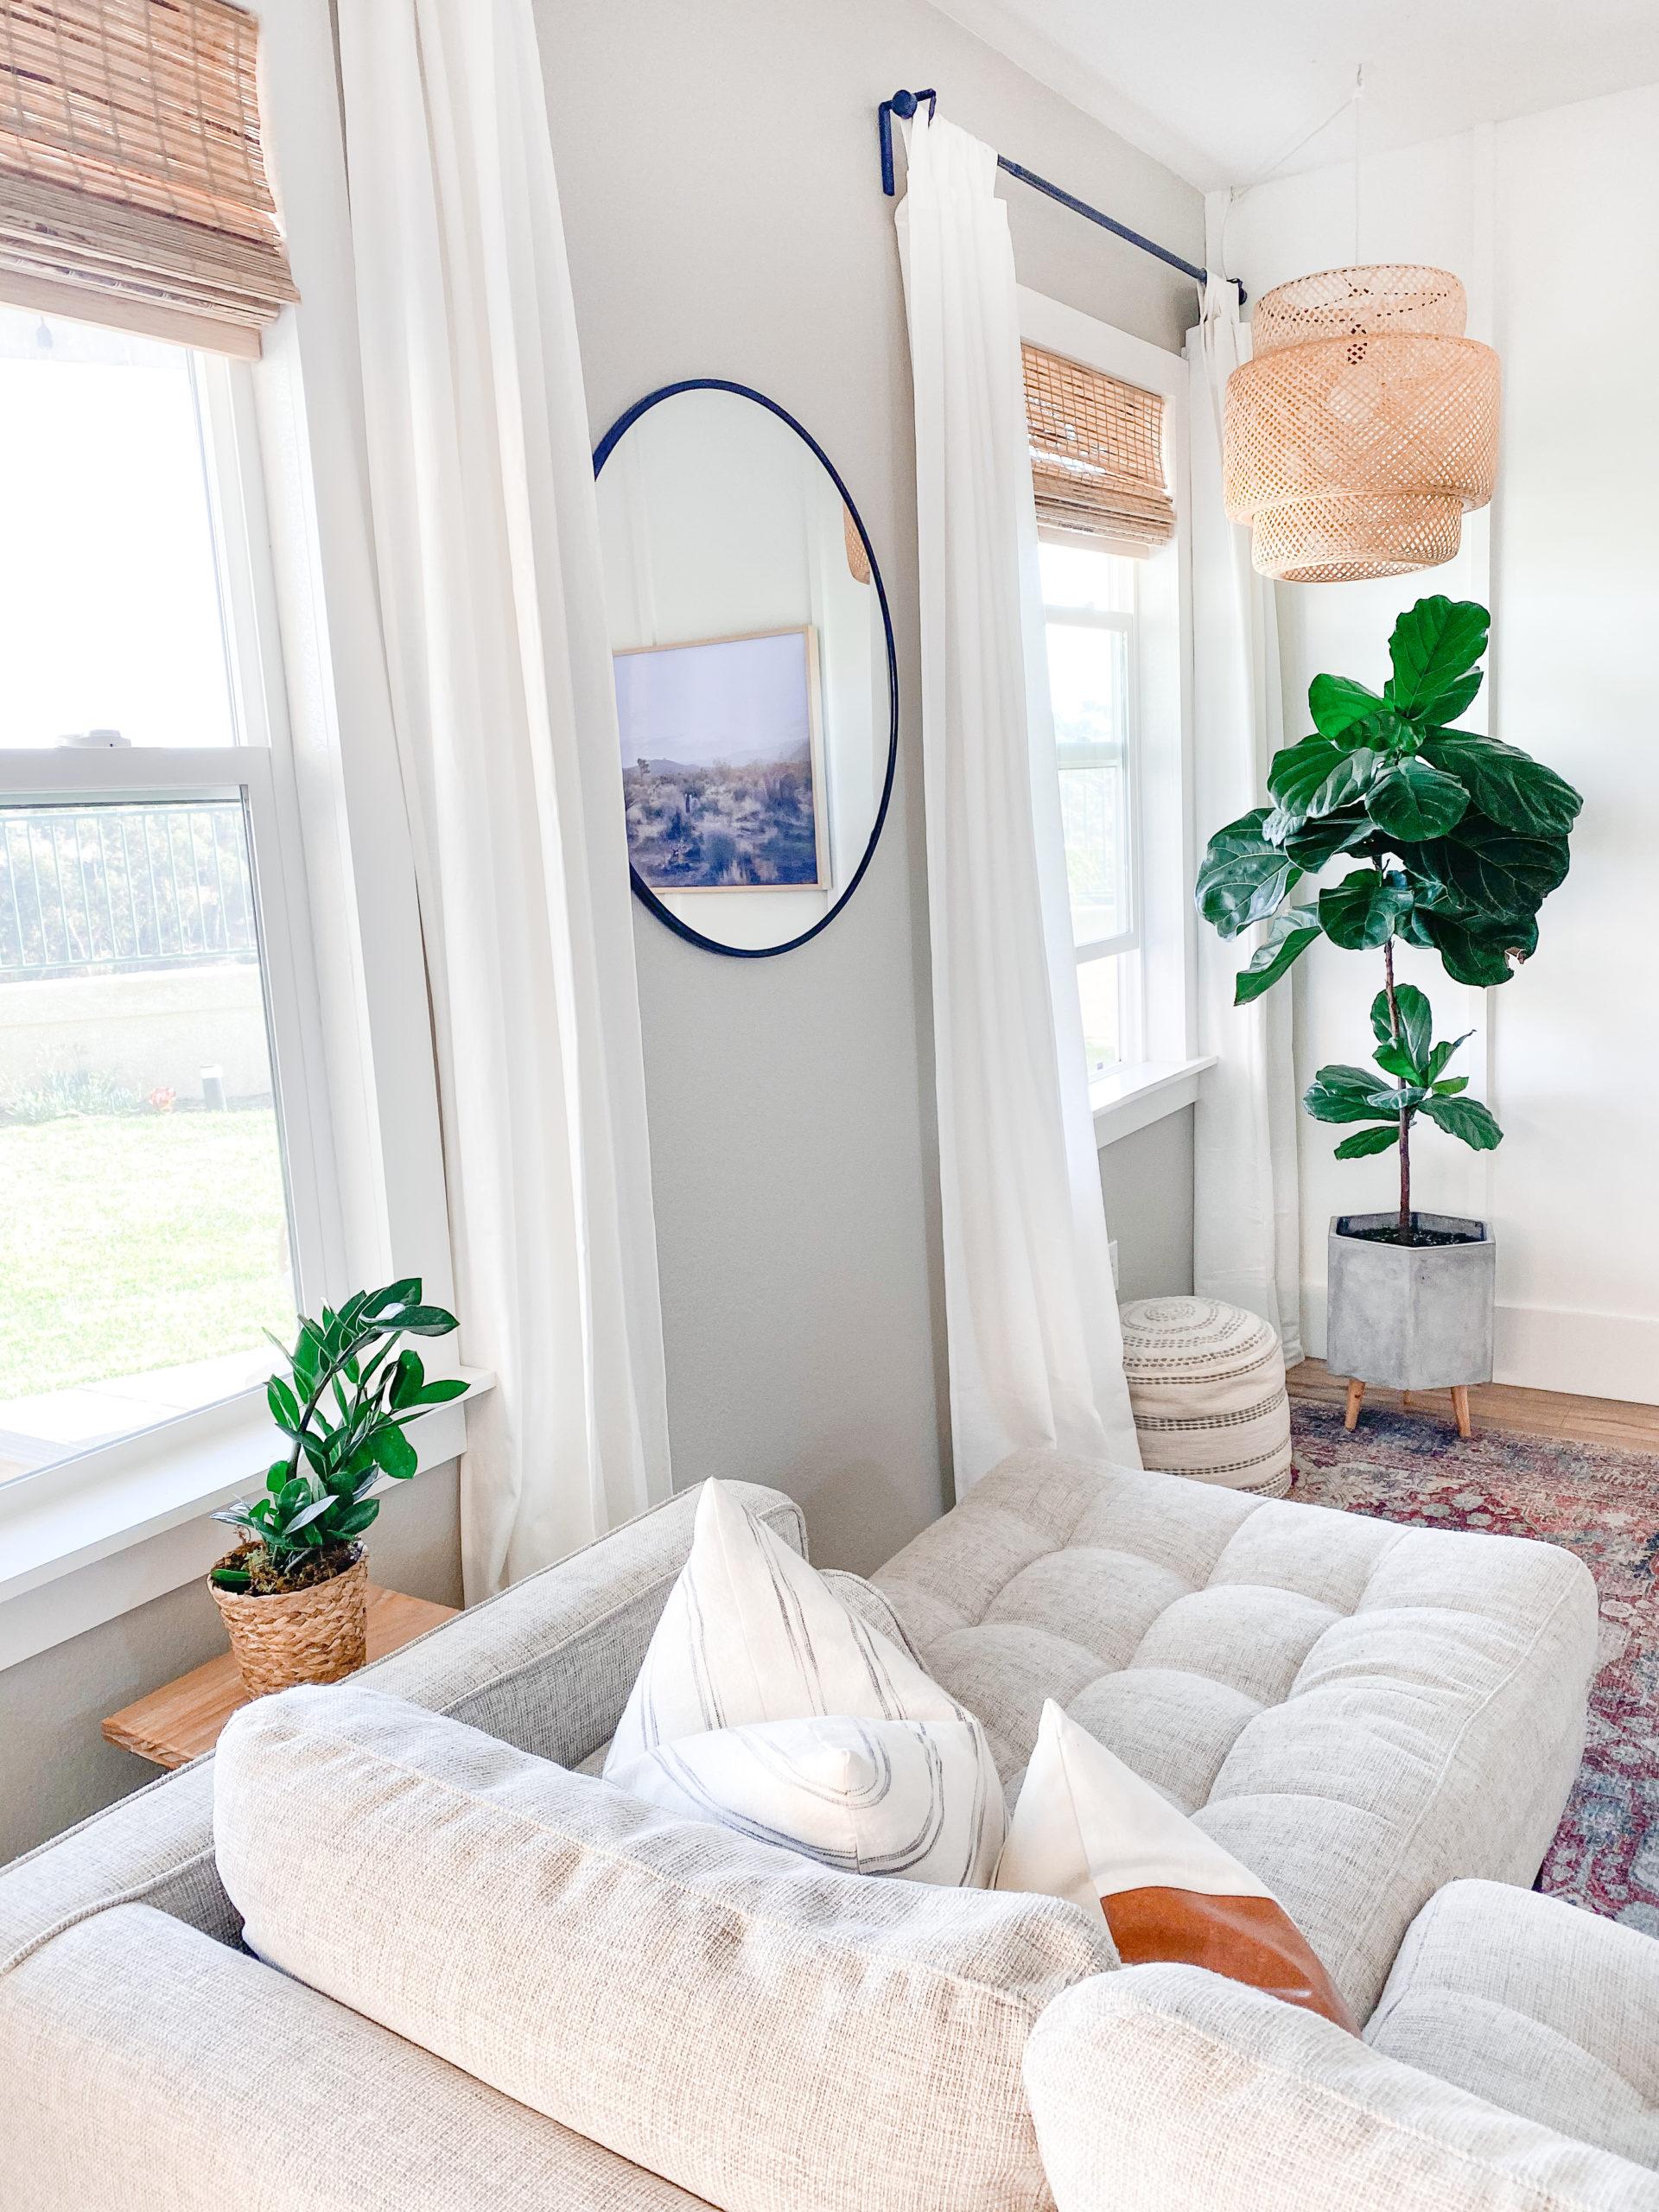 DIY Window Frame In A Snap!